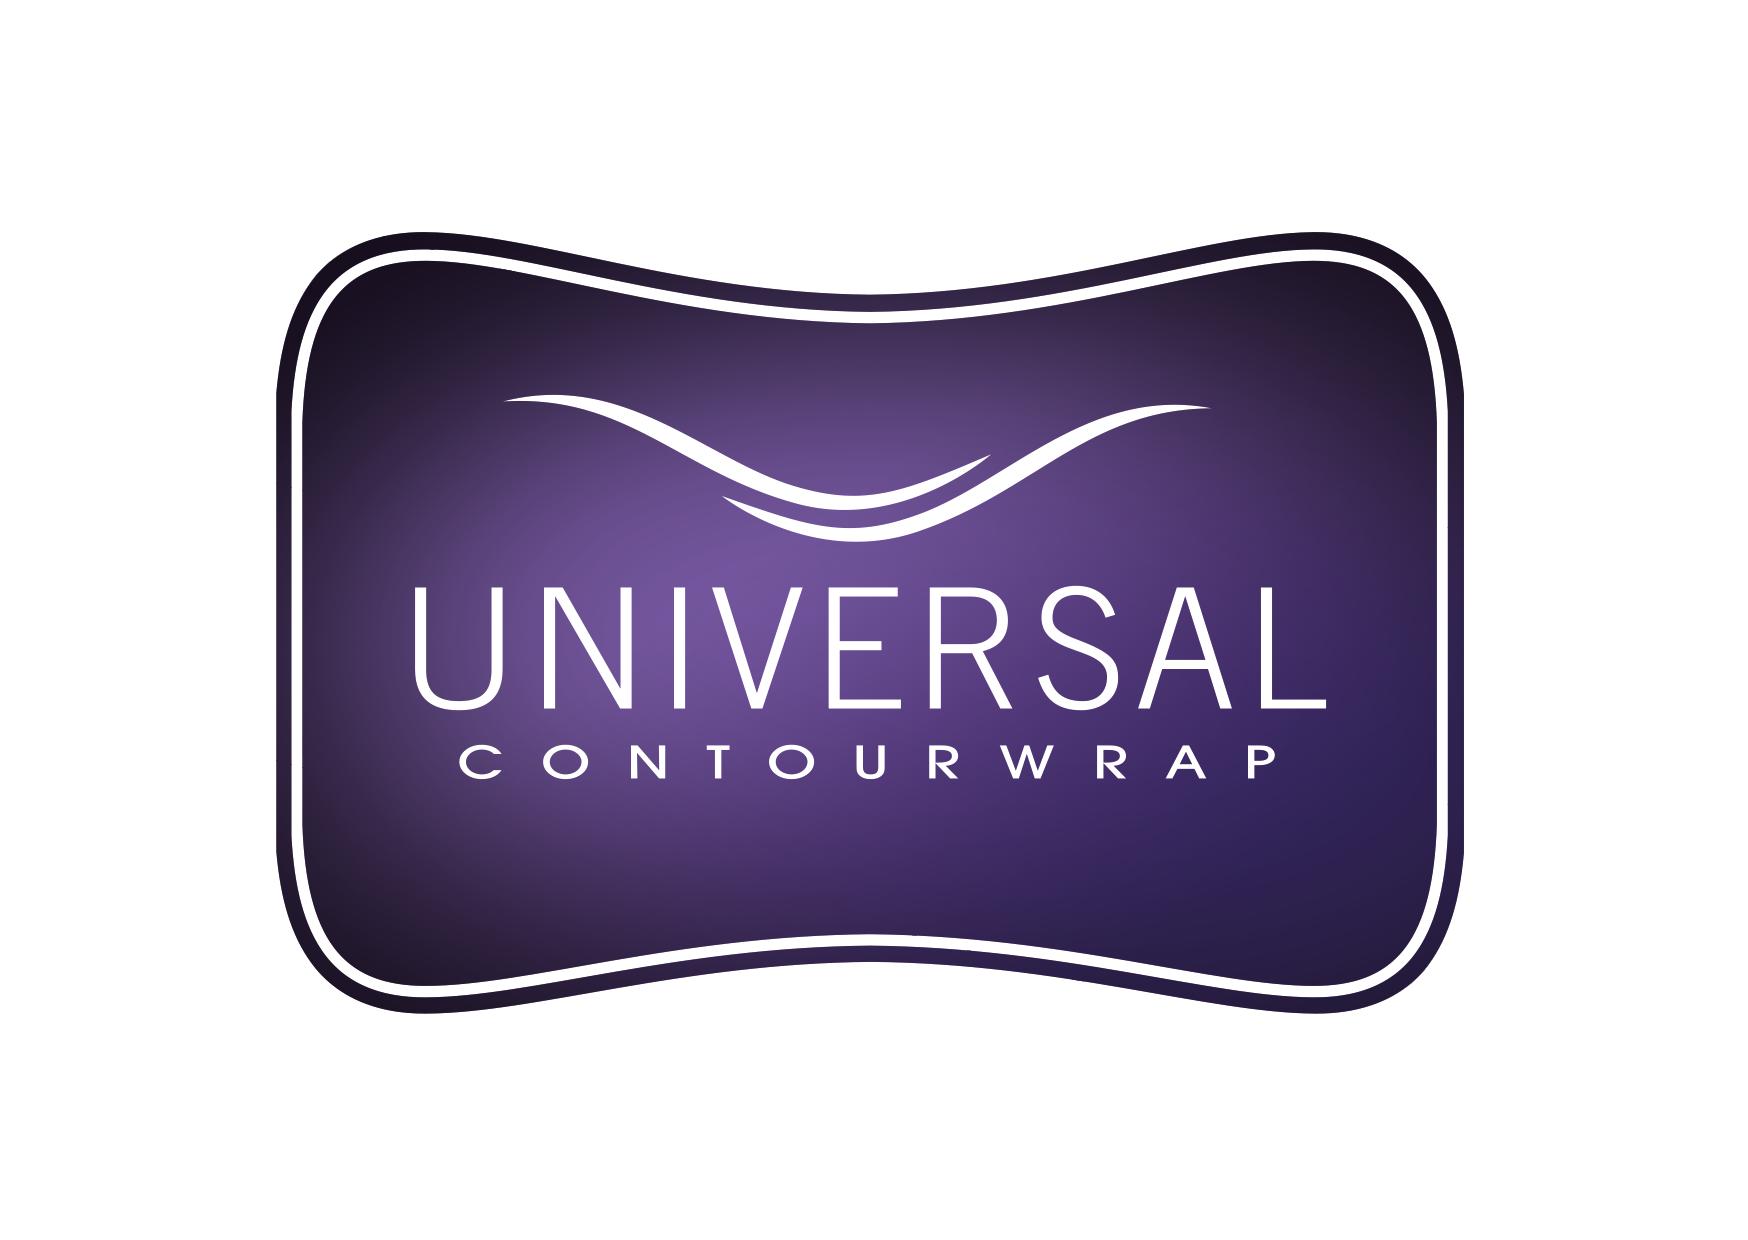 Universal contour brand used at Debora's beauty studio. Universal contour, London, Knightsbridge.